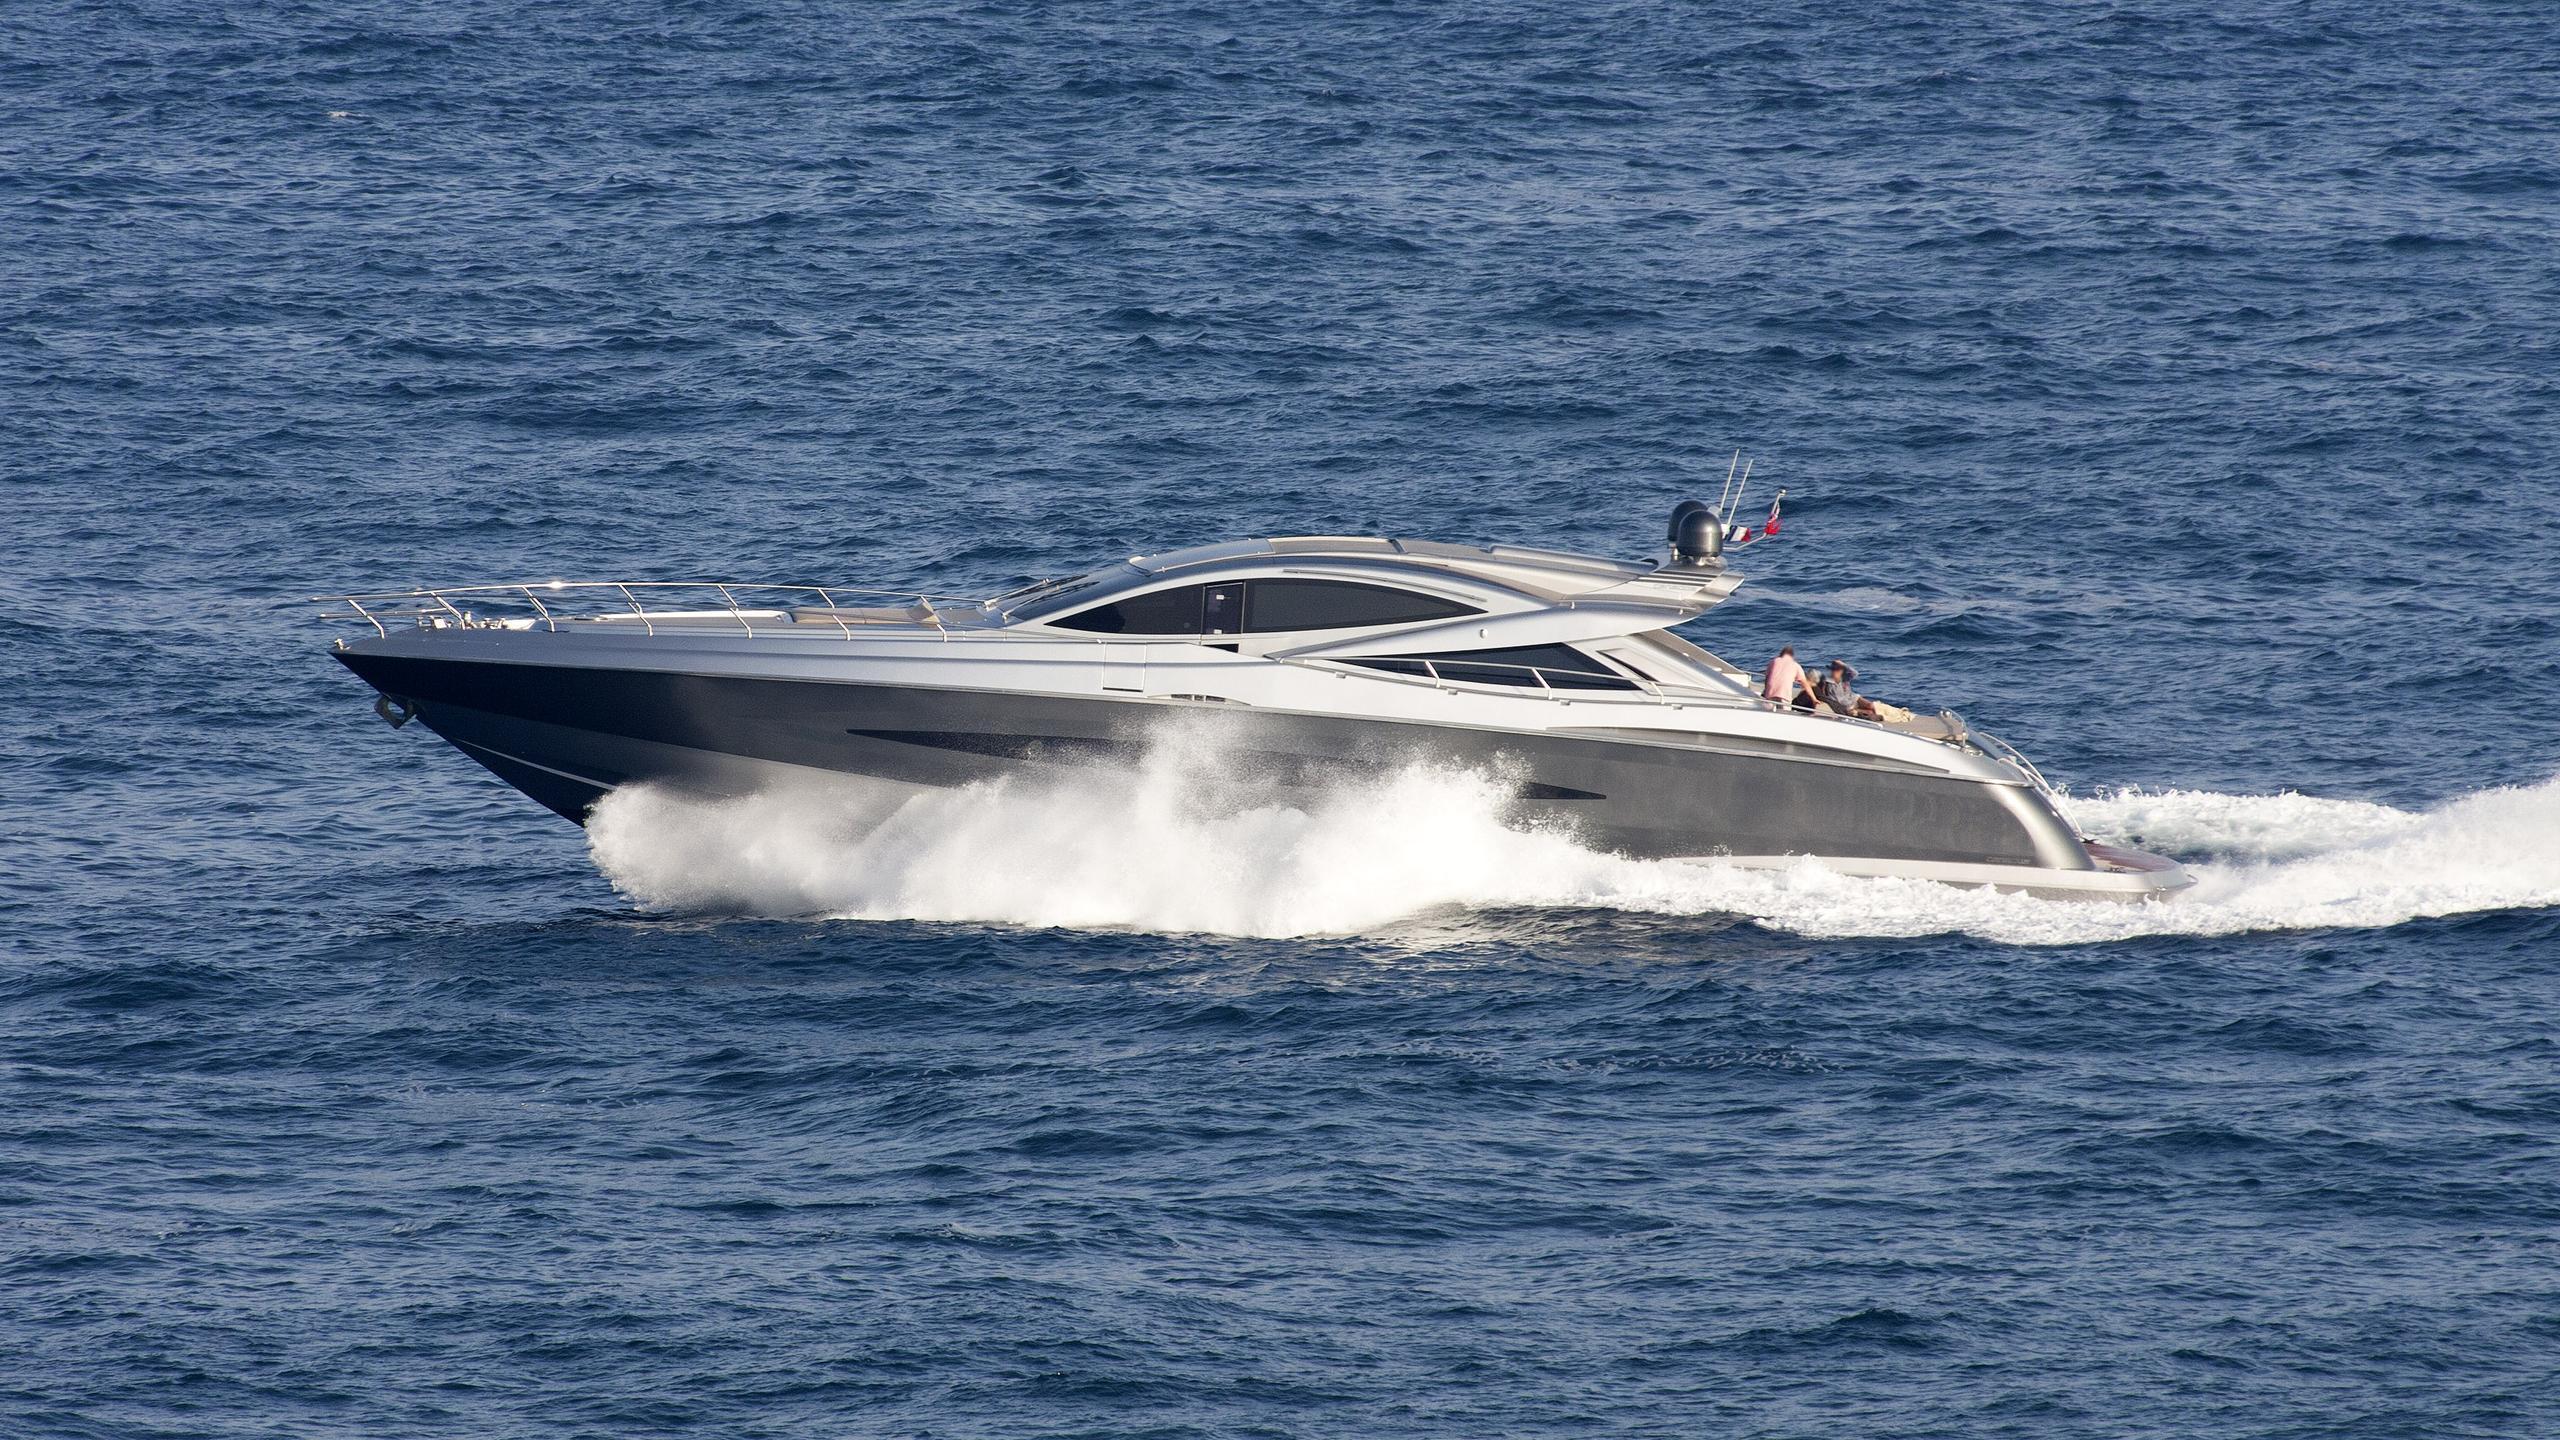 j-and-li-motoryacht-canados-90-open-2008-27m-profile-running